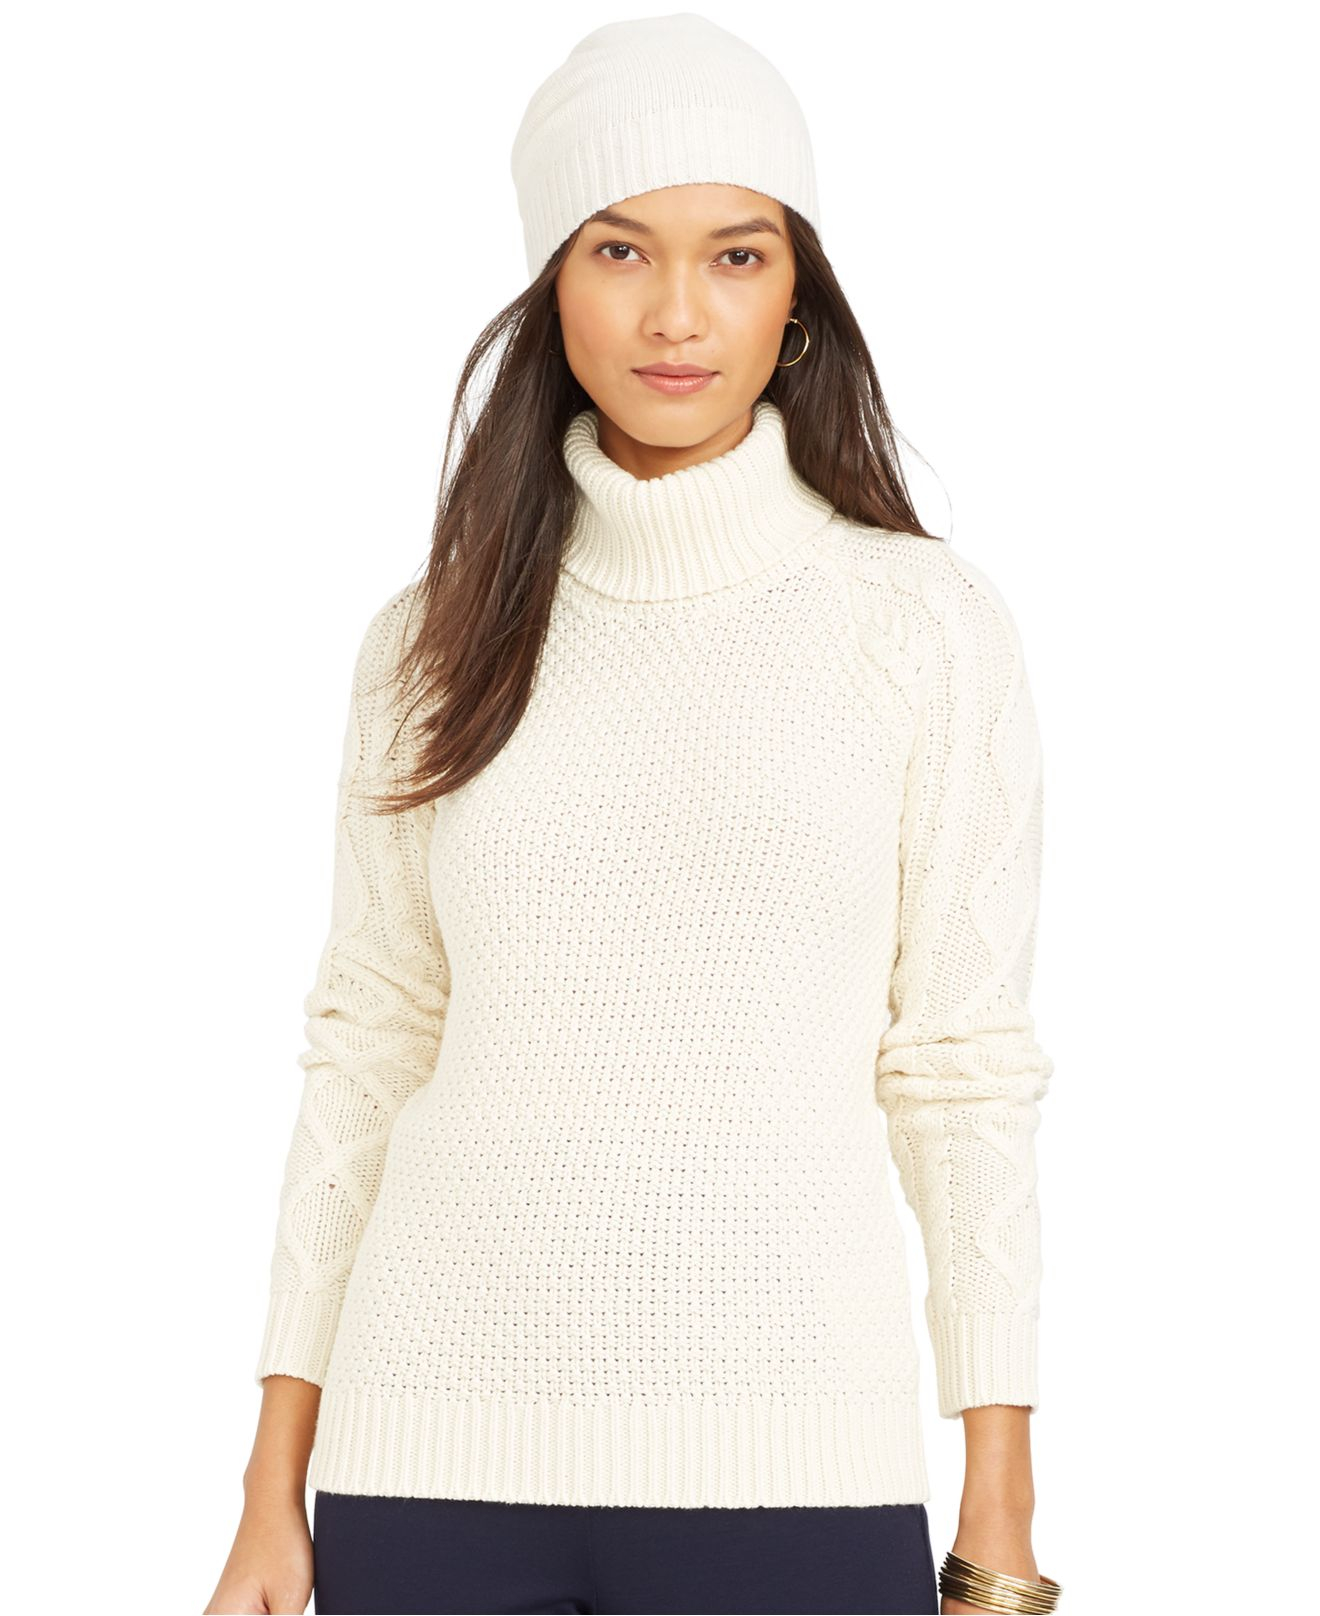 Lauren by ralph lauren Cable-Knit Turtleneck Sweater in Natural | Lyst